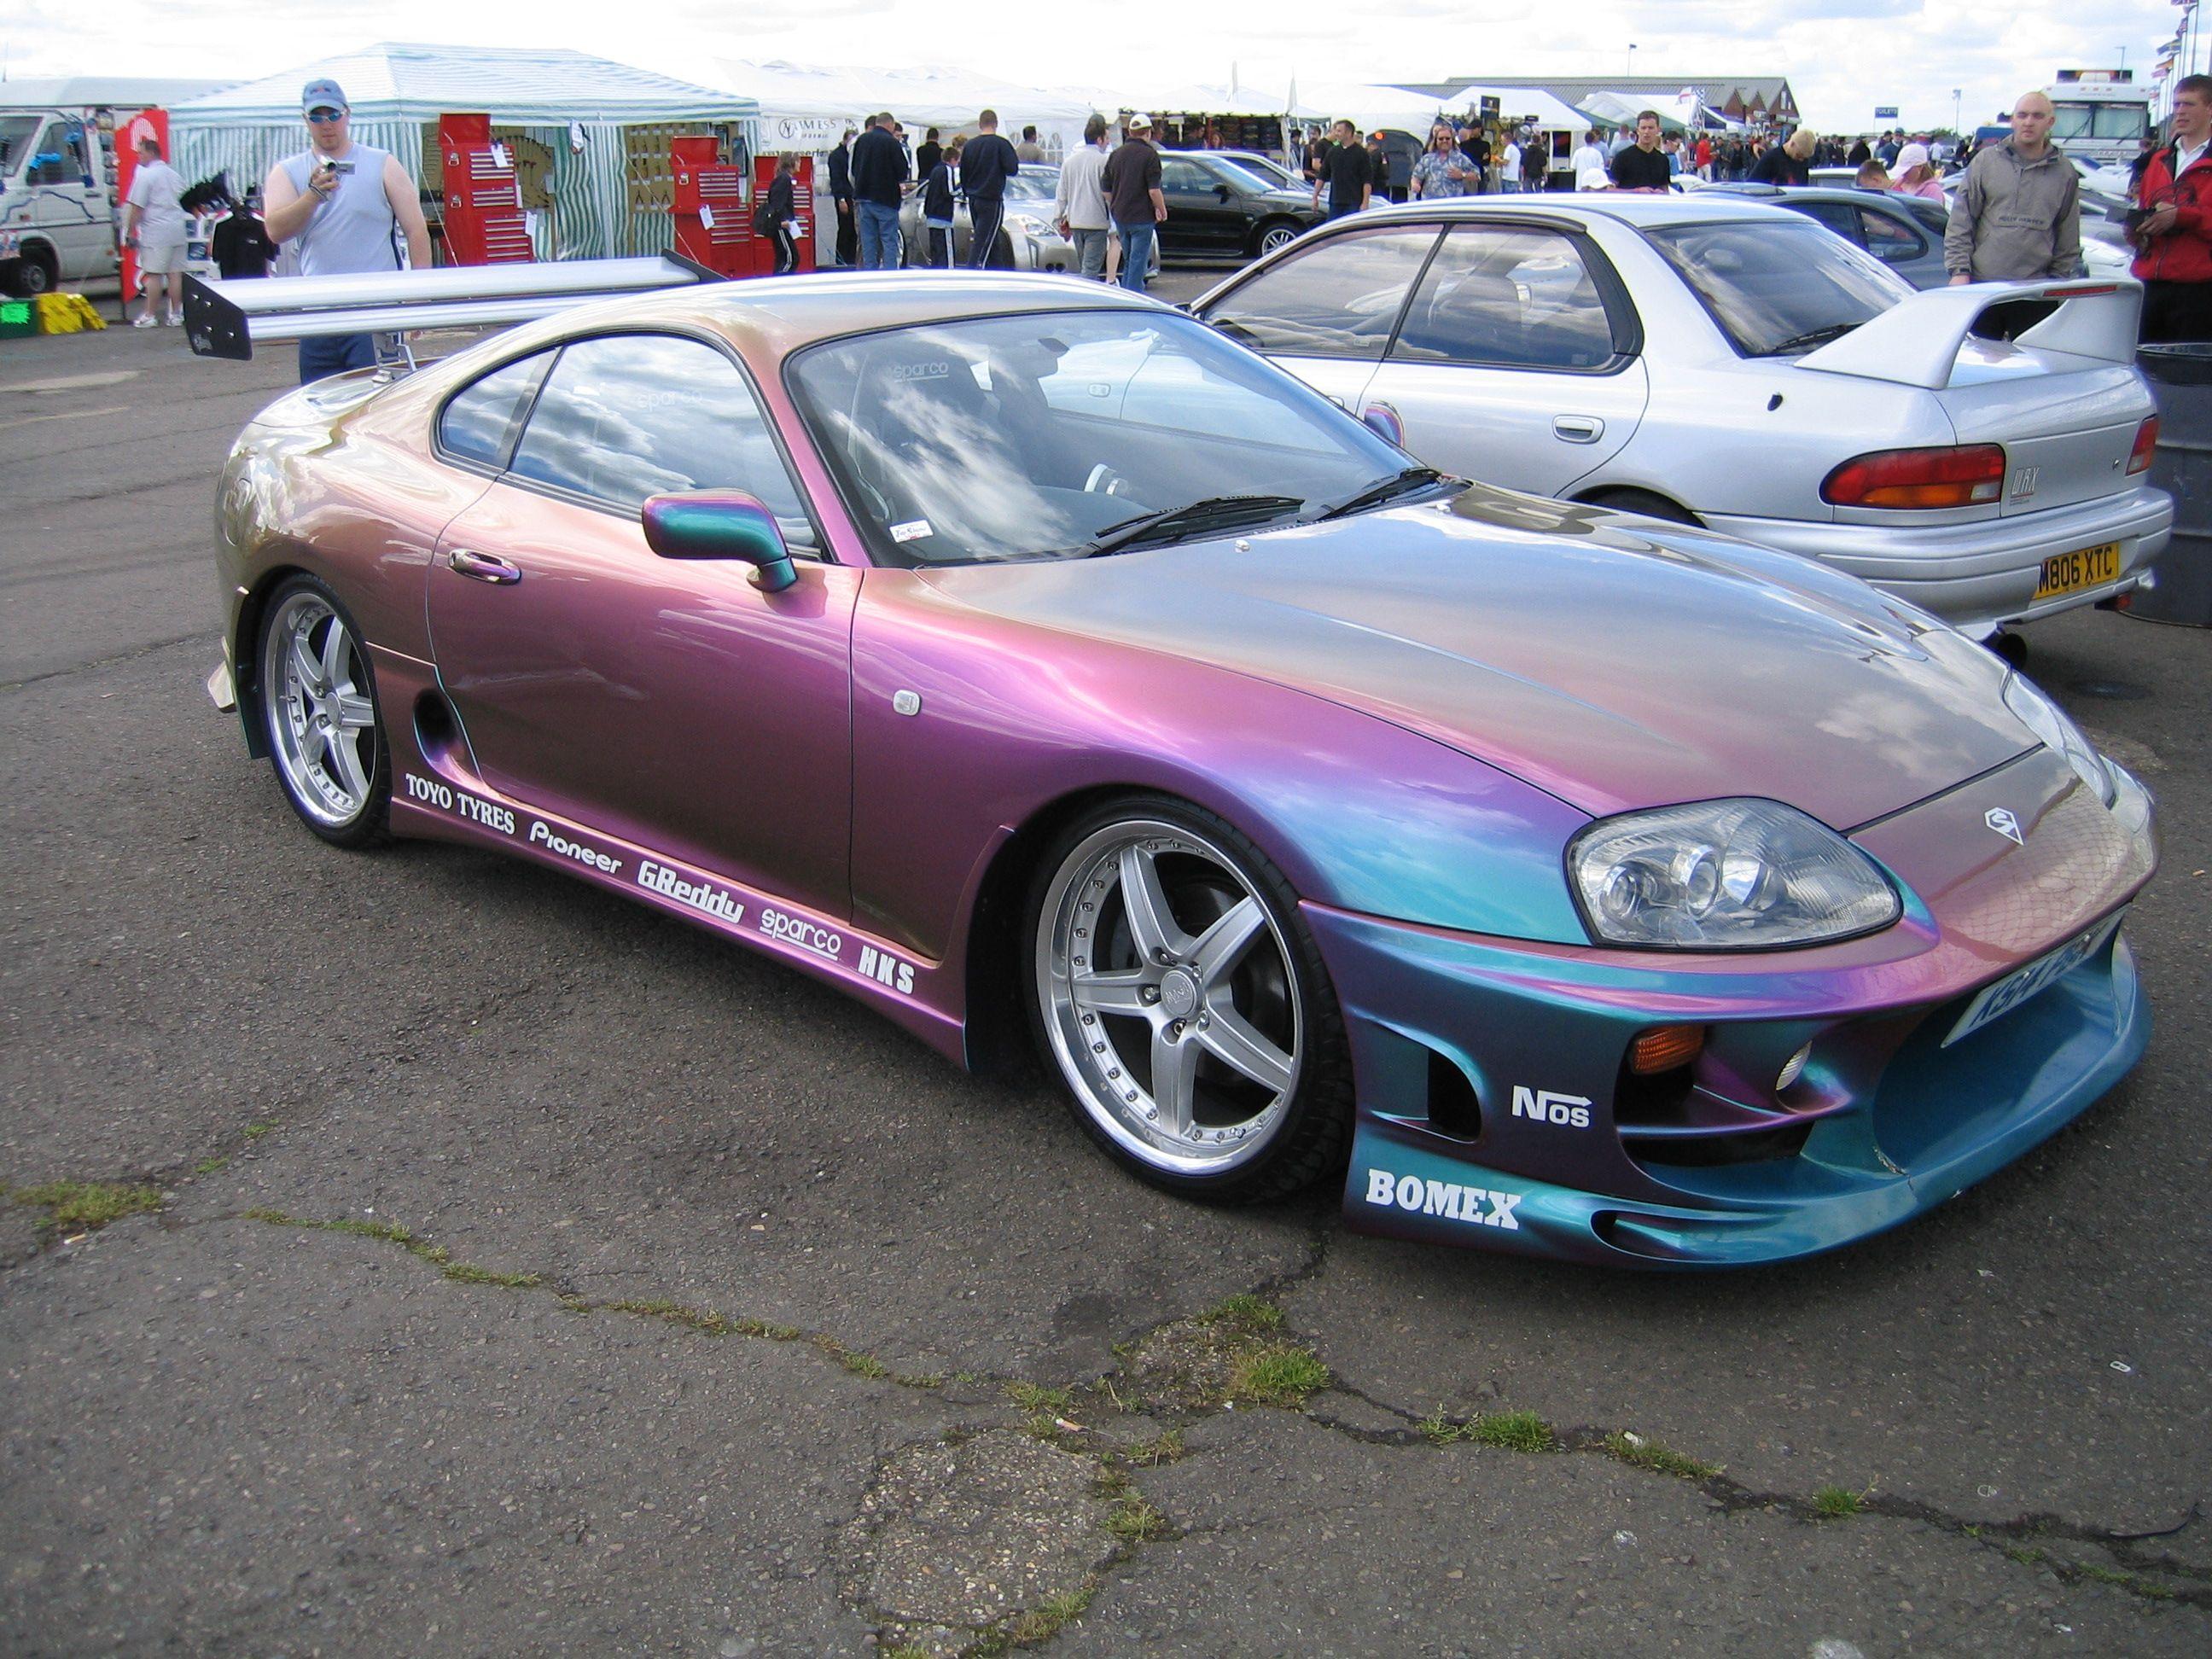 A Pearlescent Toyota Supra.